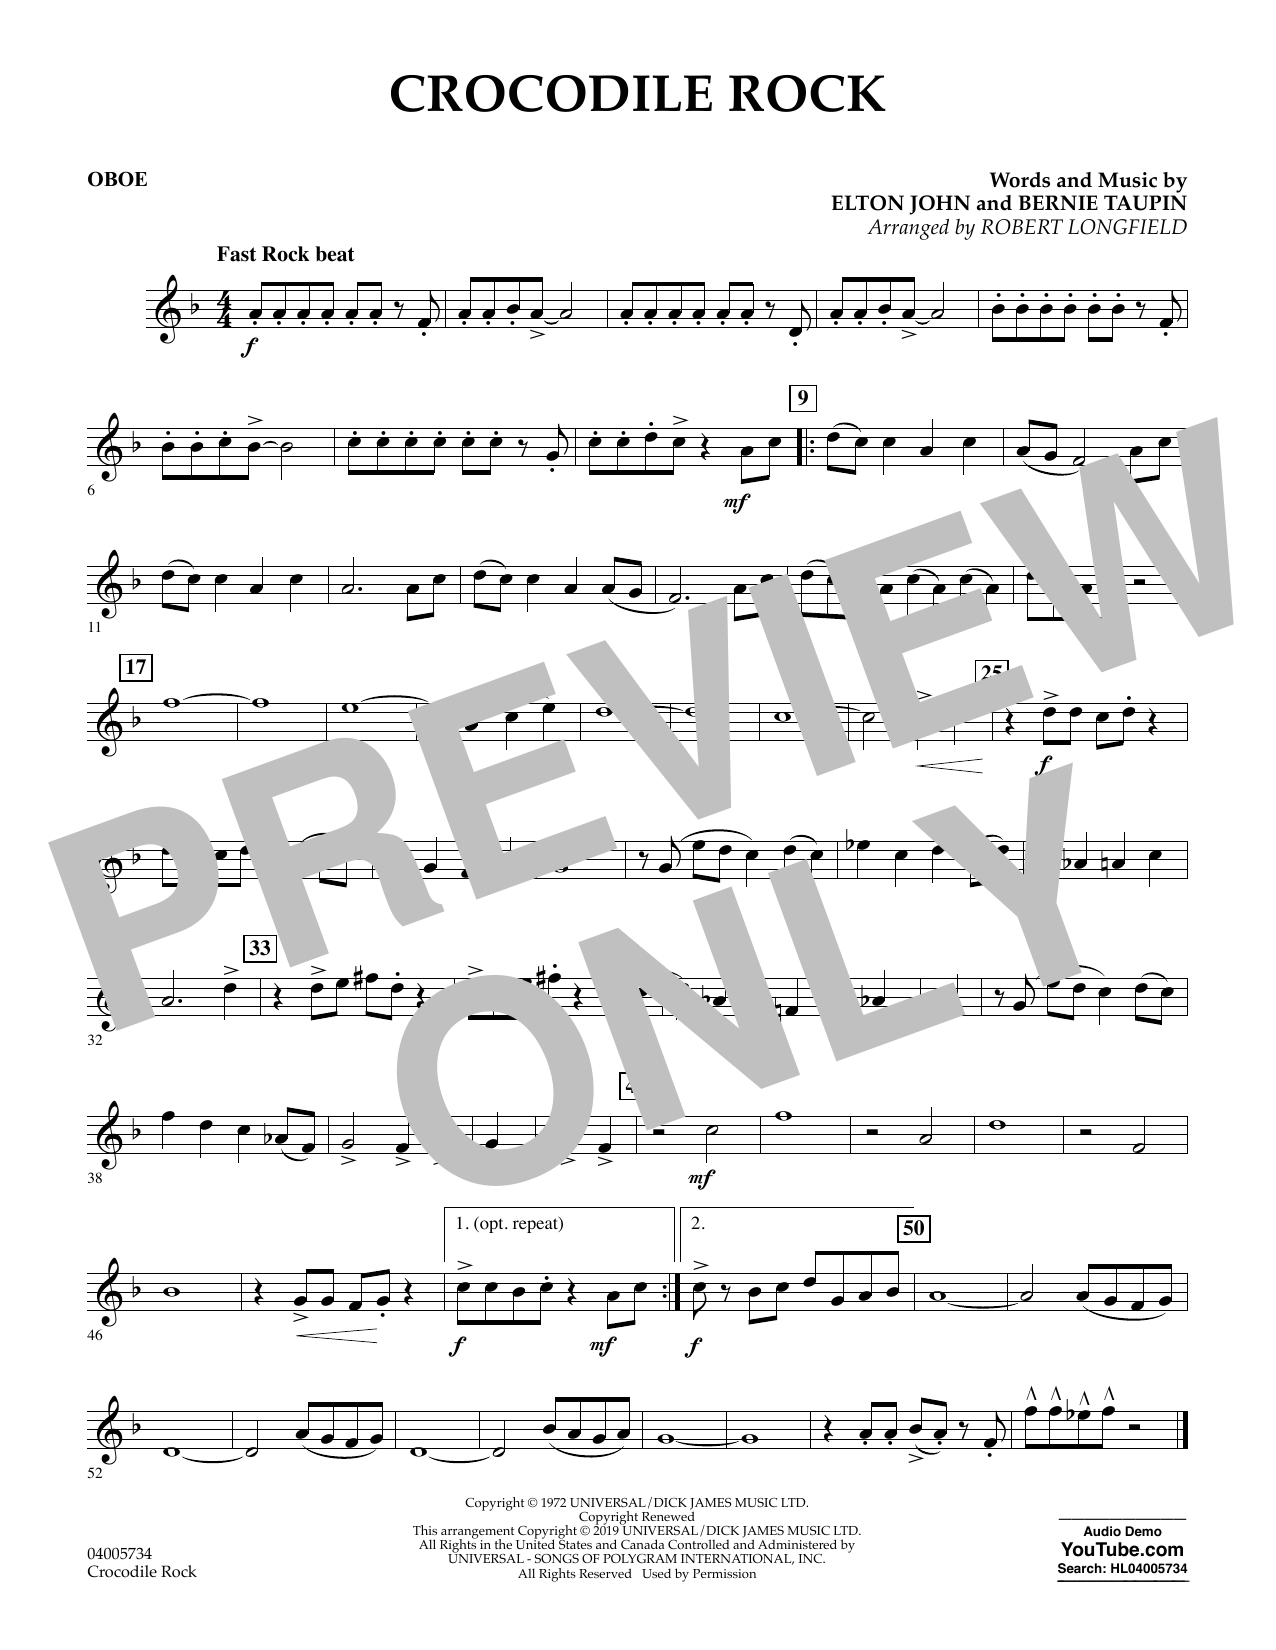 Crocodile Rock (arr. Robert Longfield) - Oboe (Concert Band)